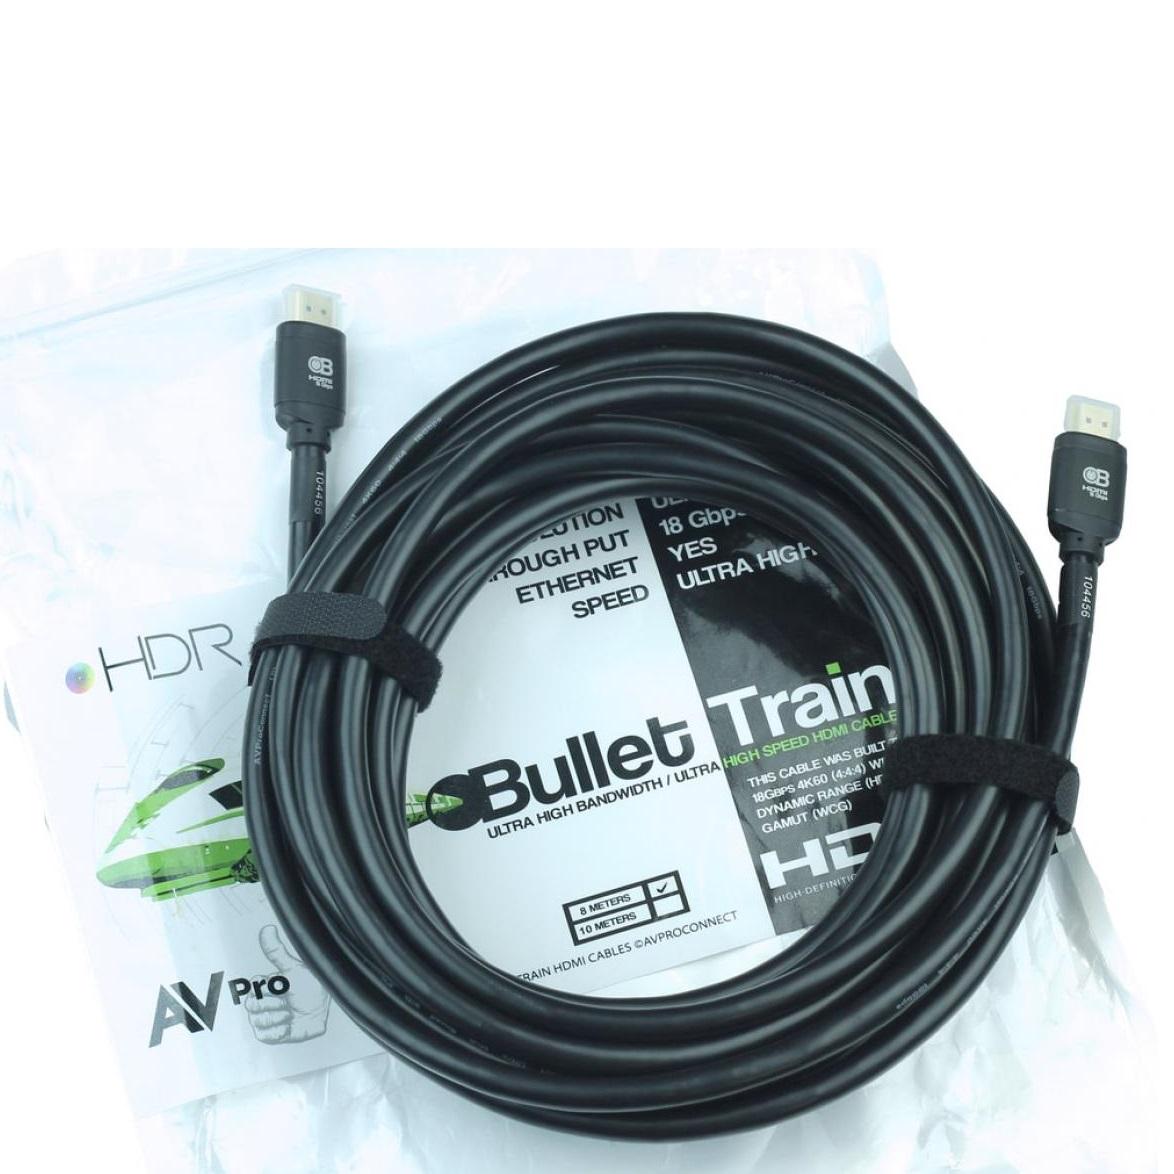 HDMI Ultra High Speed кабель AV Pro Edge AC-BT10-AUHD